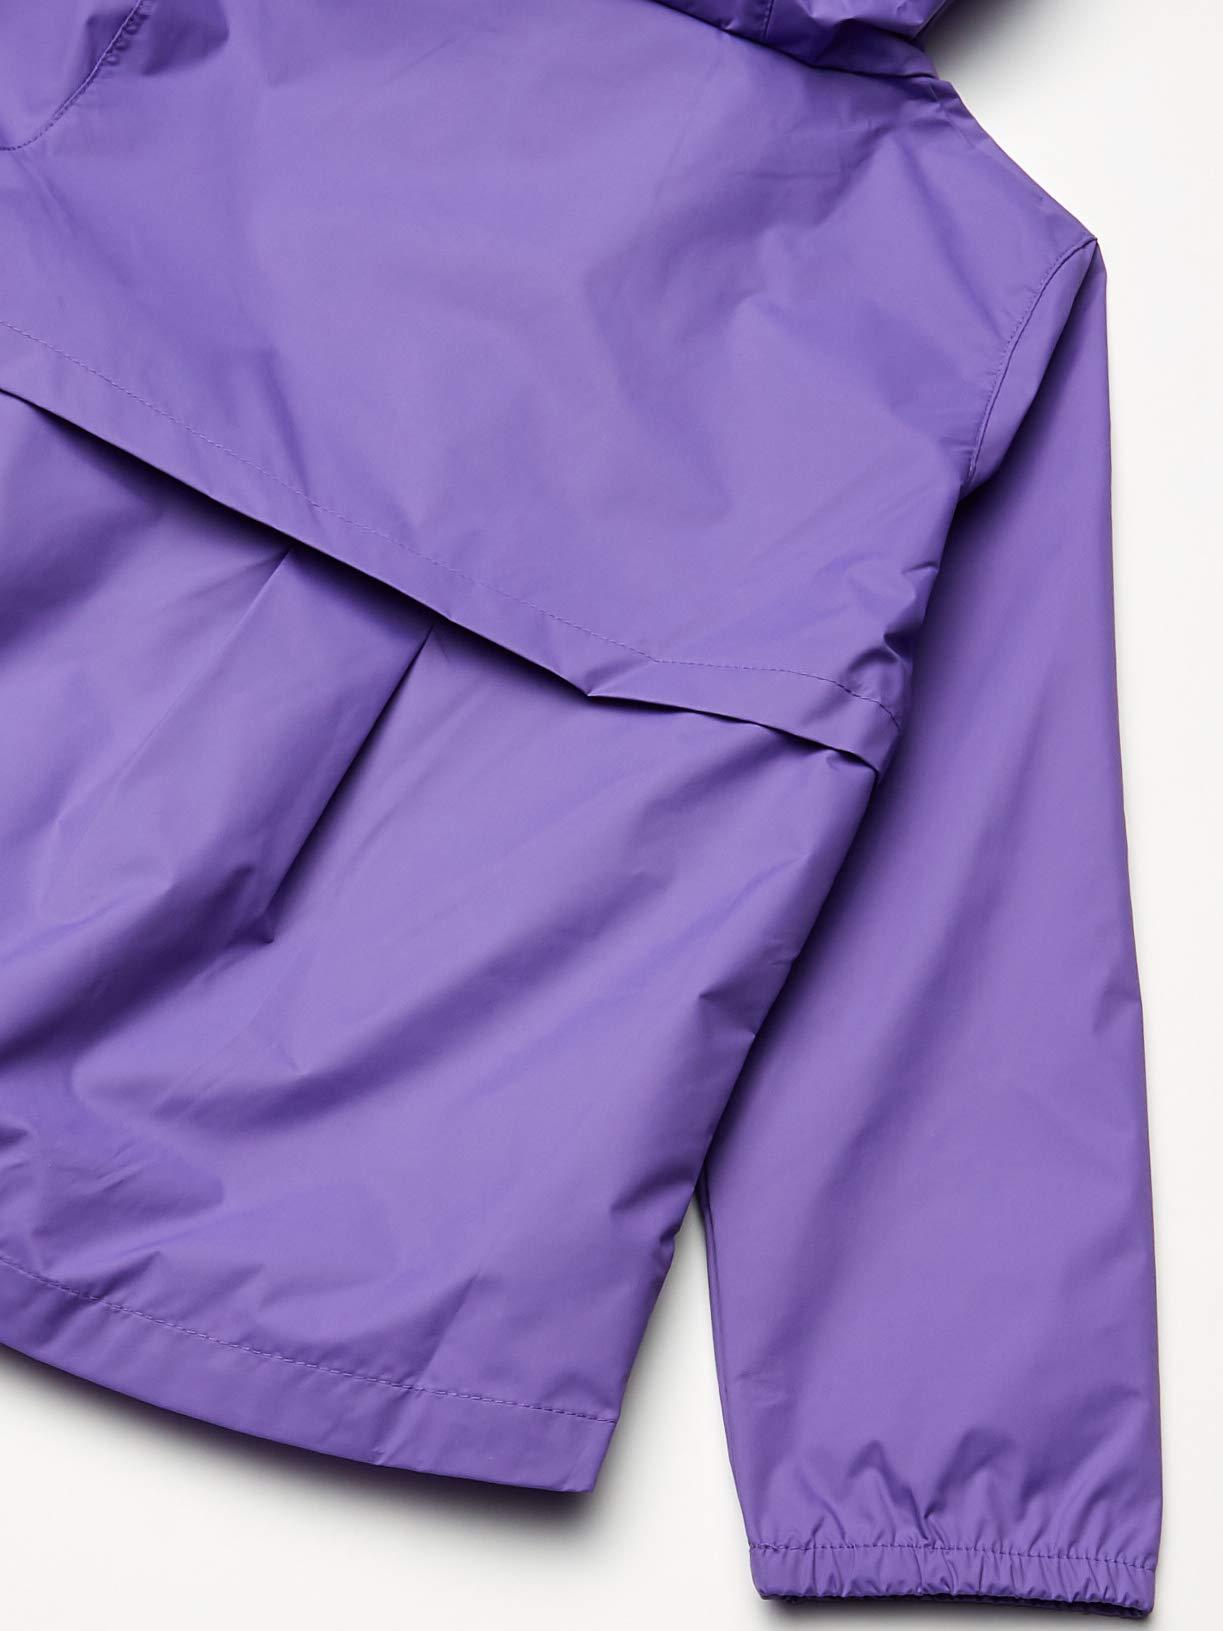 Aiyukker Girls Rain Jacket Lightweight Waterproof Raincoat Outdoor Hooded Fleece Lined Windbreaker Jacket for Kids